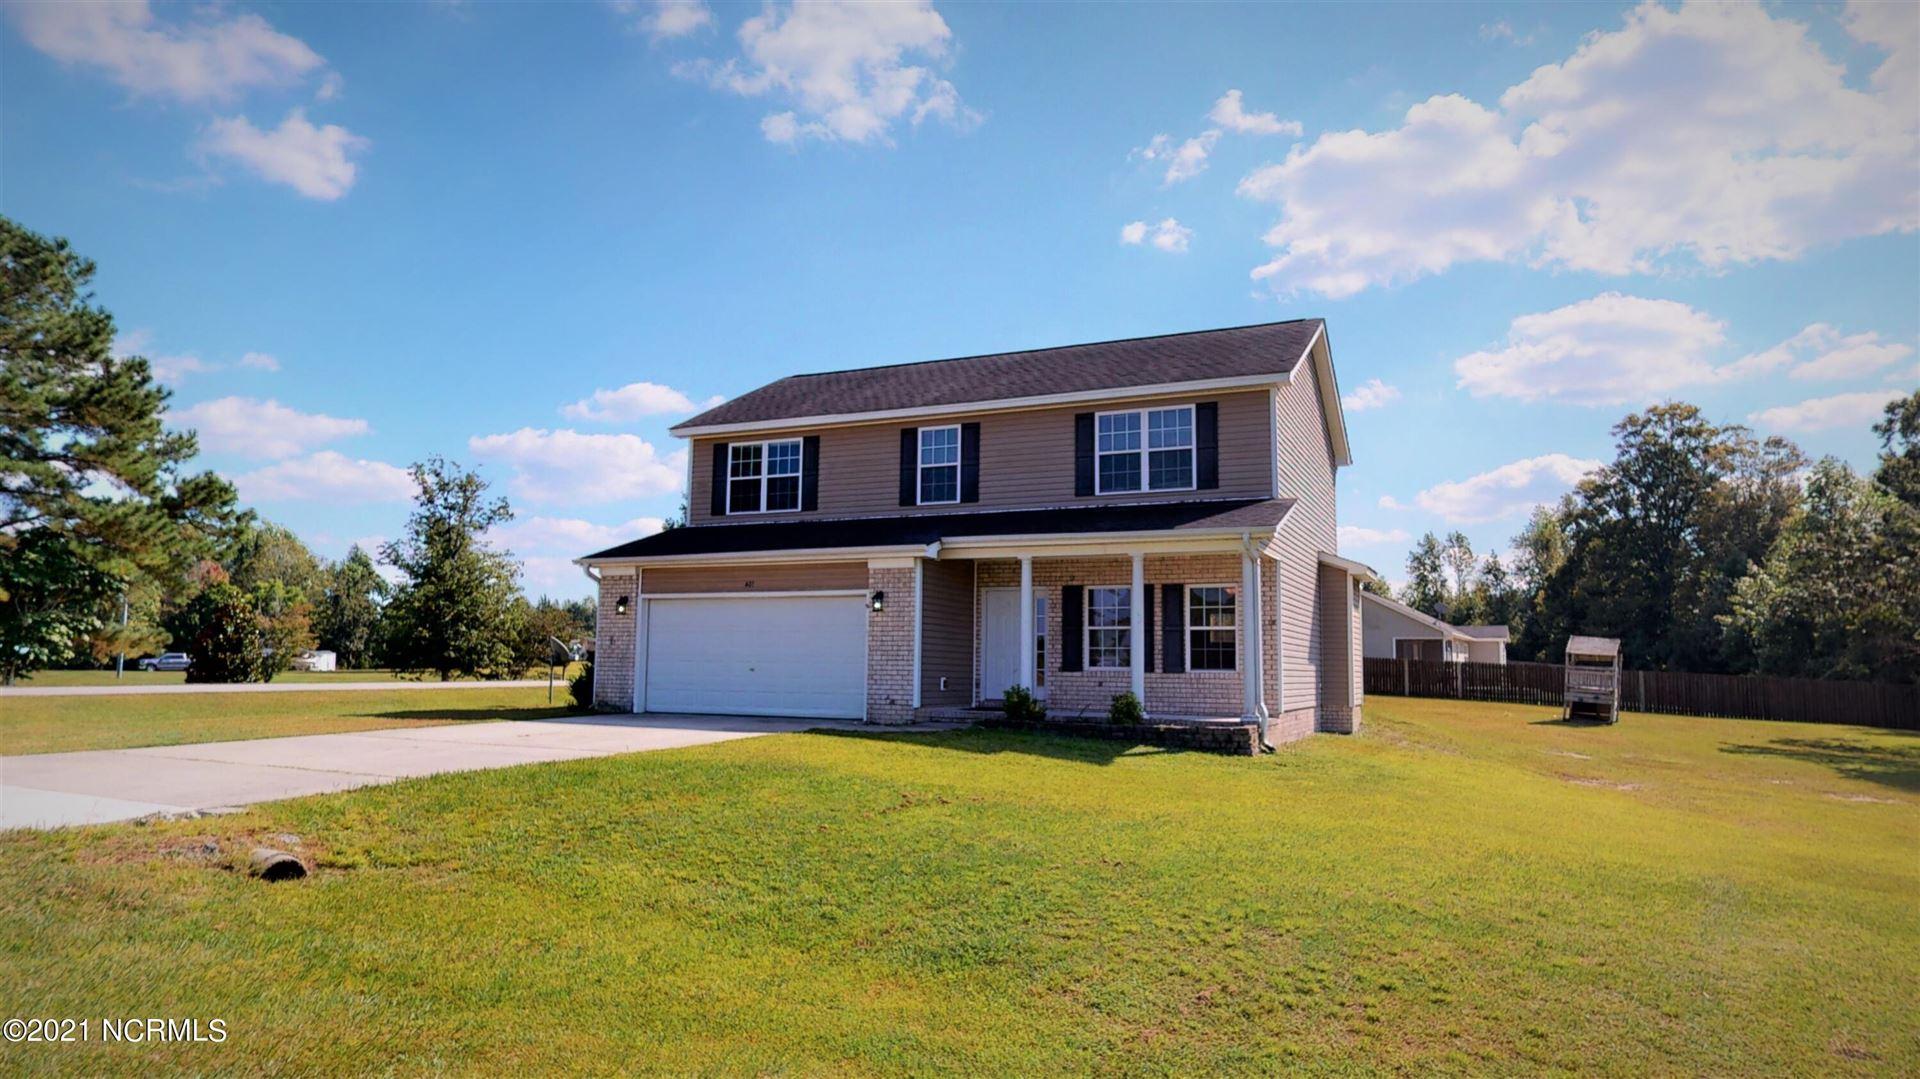 Photo of 401 Mossy Oak Lane, Jacksonville, NC 28540 (MLS # 100295129)